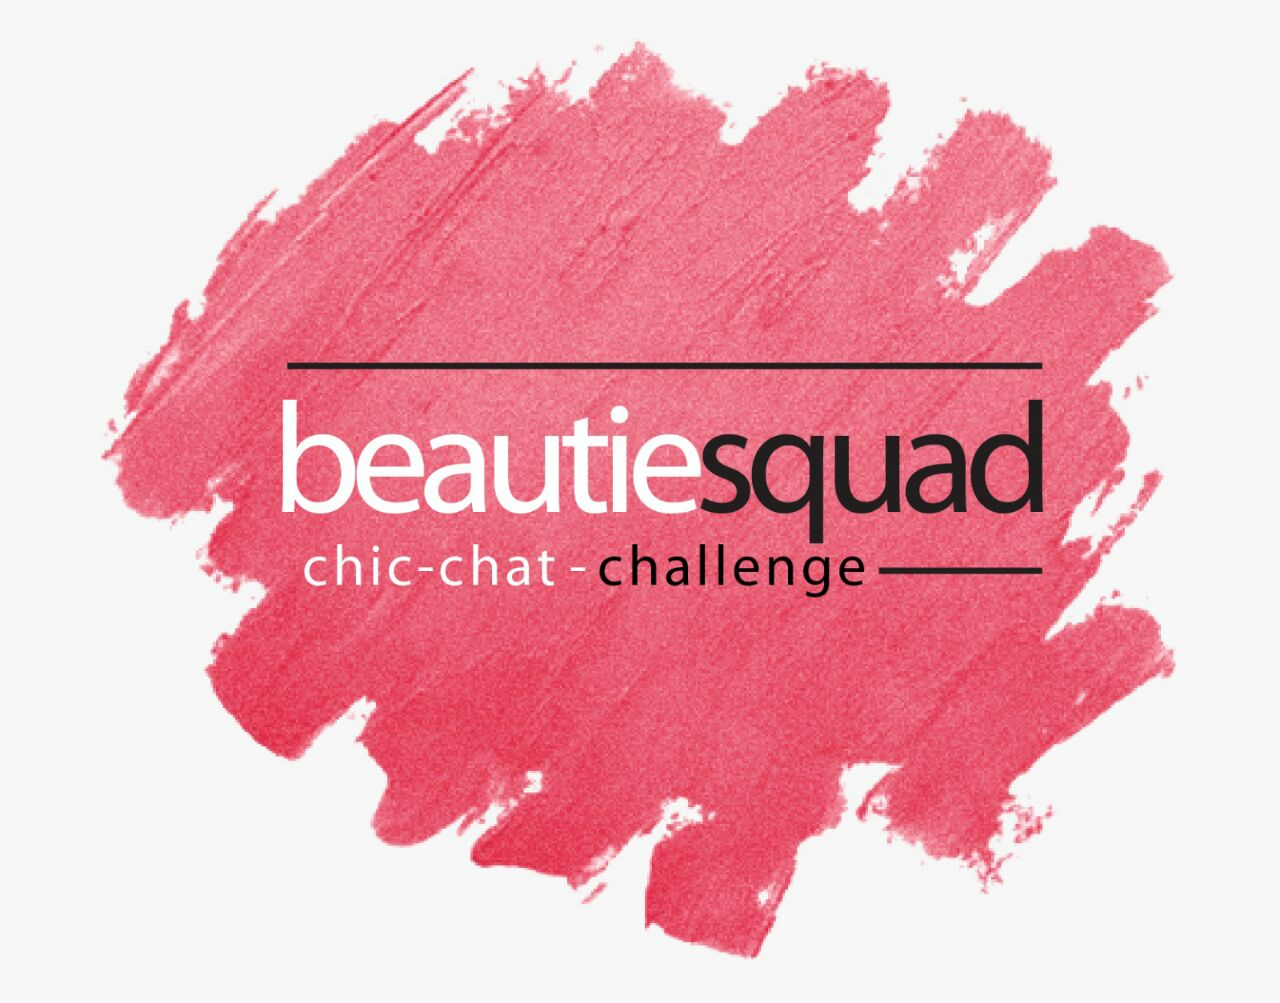 I'm part of BeautieSquad